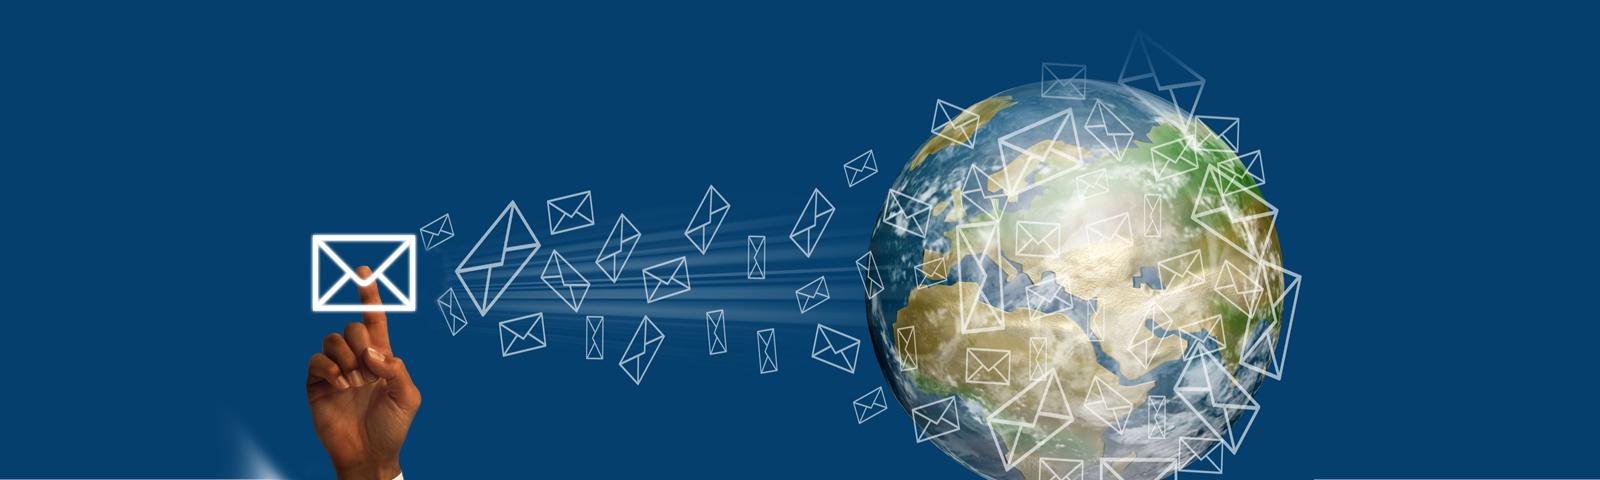 Email Marketing | Ziza Digital